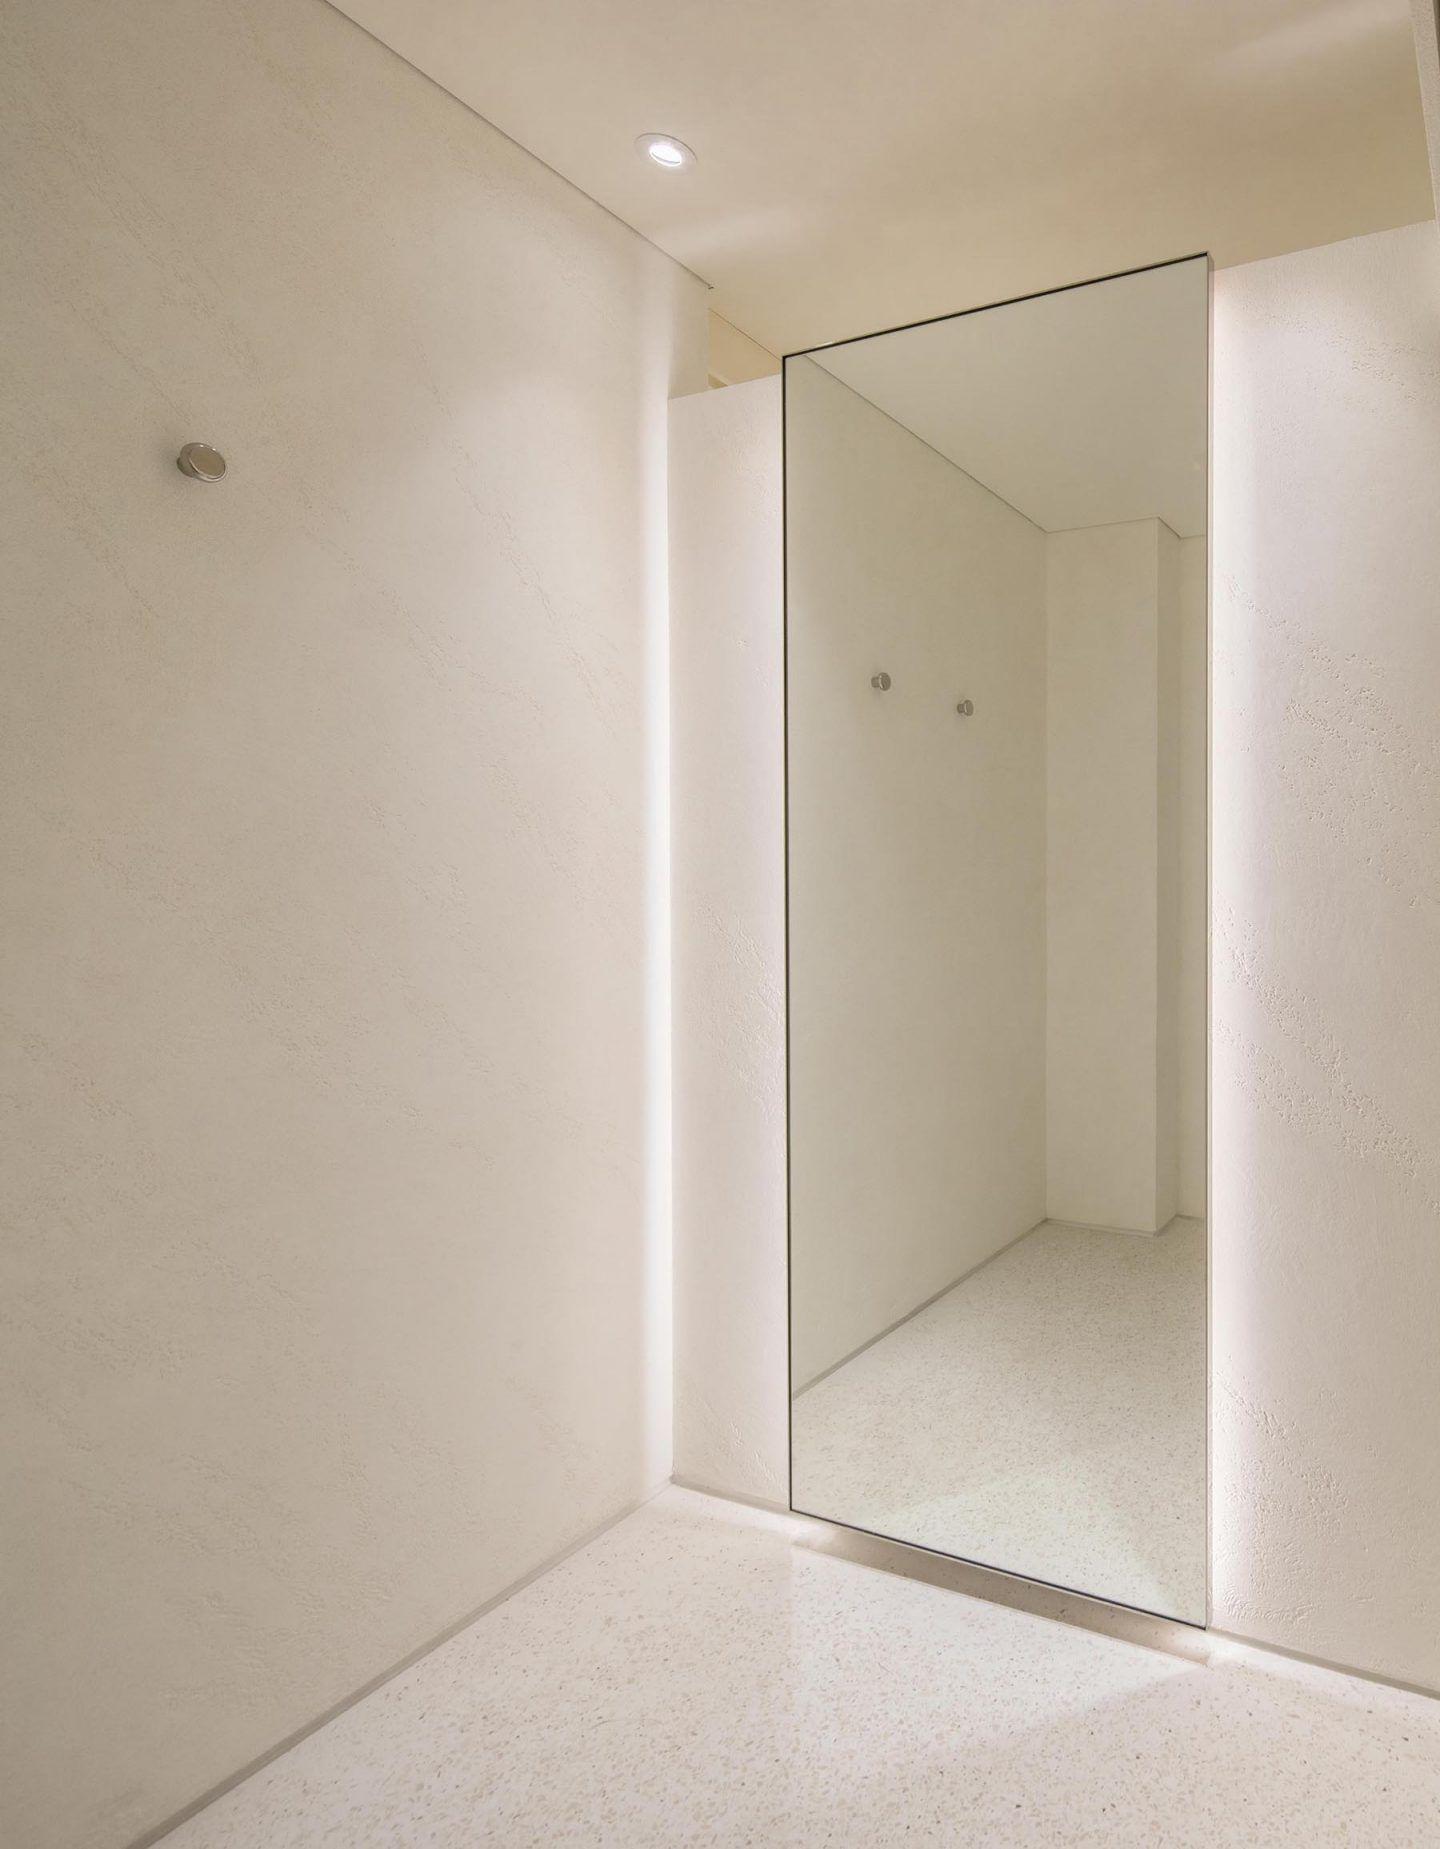 IGNANT-Design-Labotory-Le-Cashmere-6